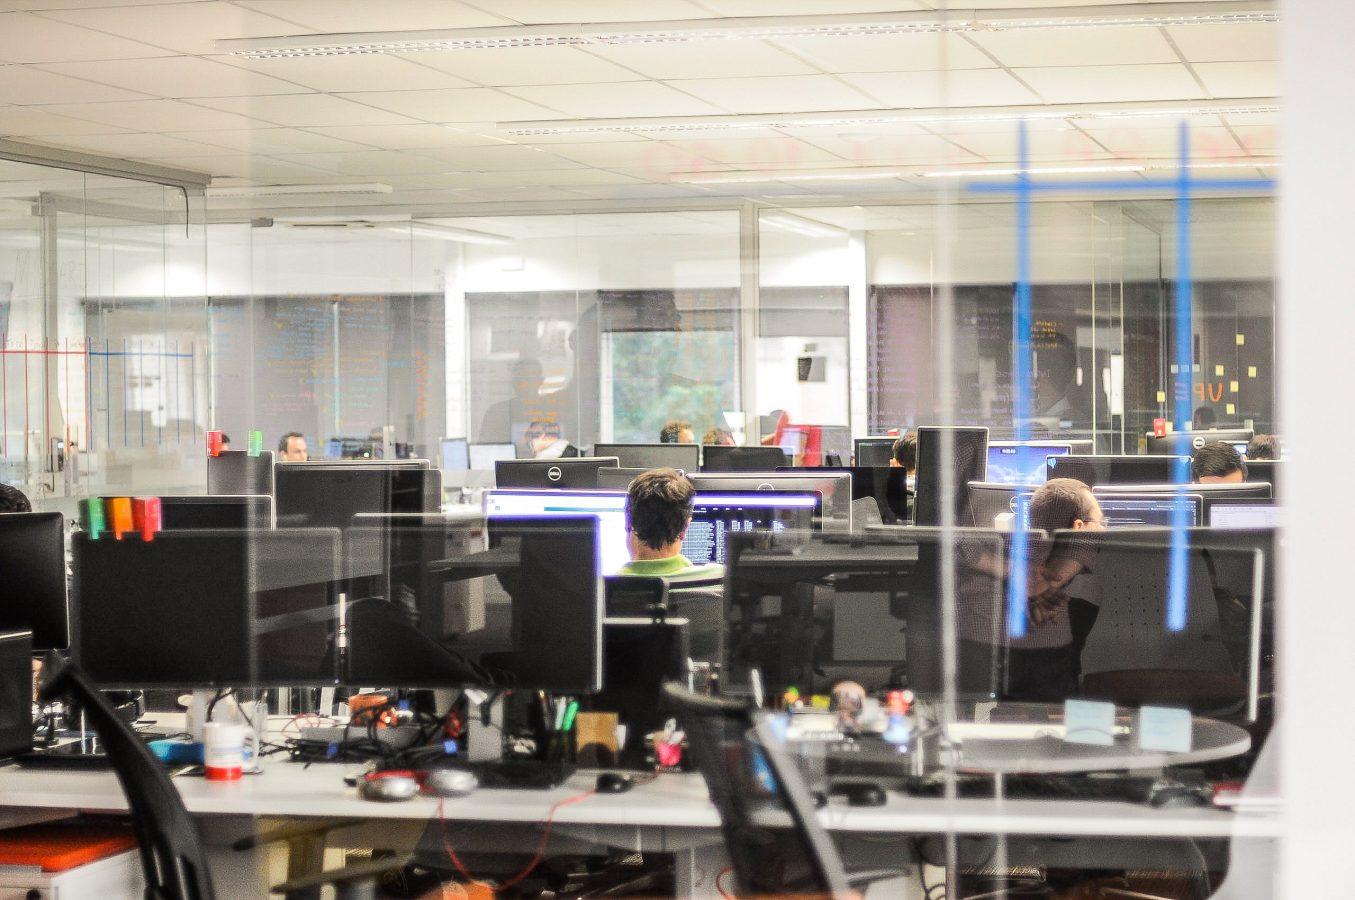 инвестиции и работа в офисе